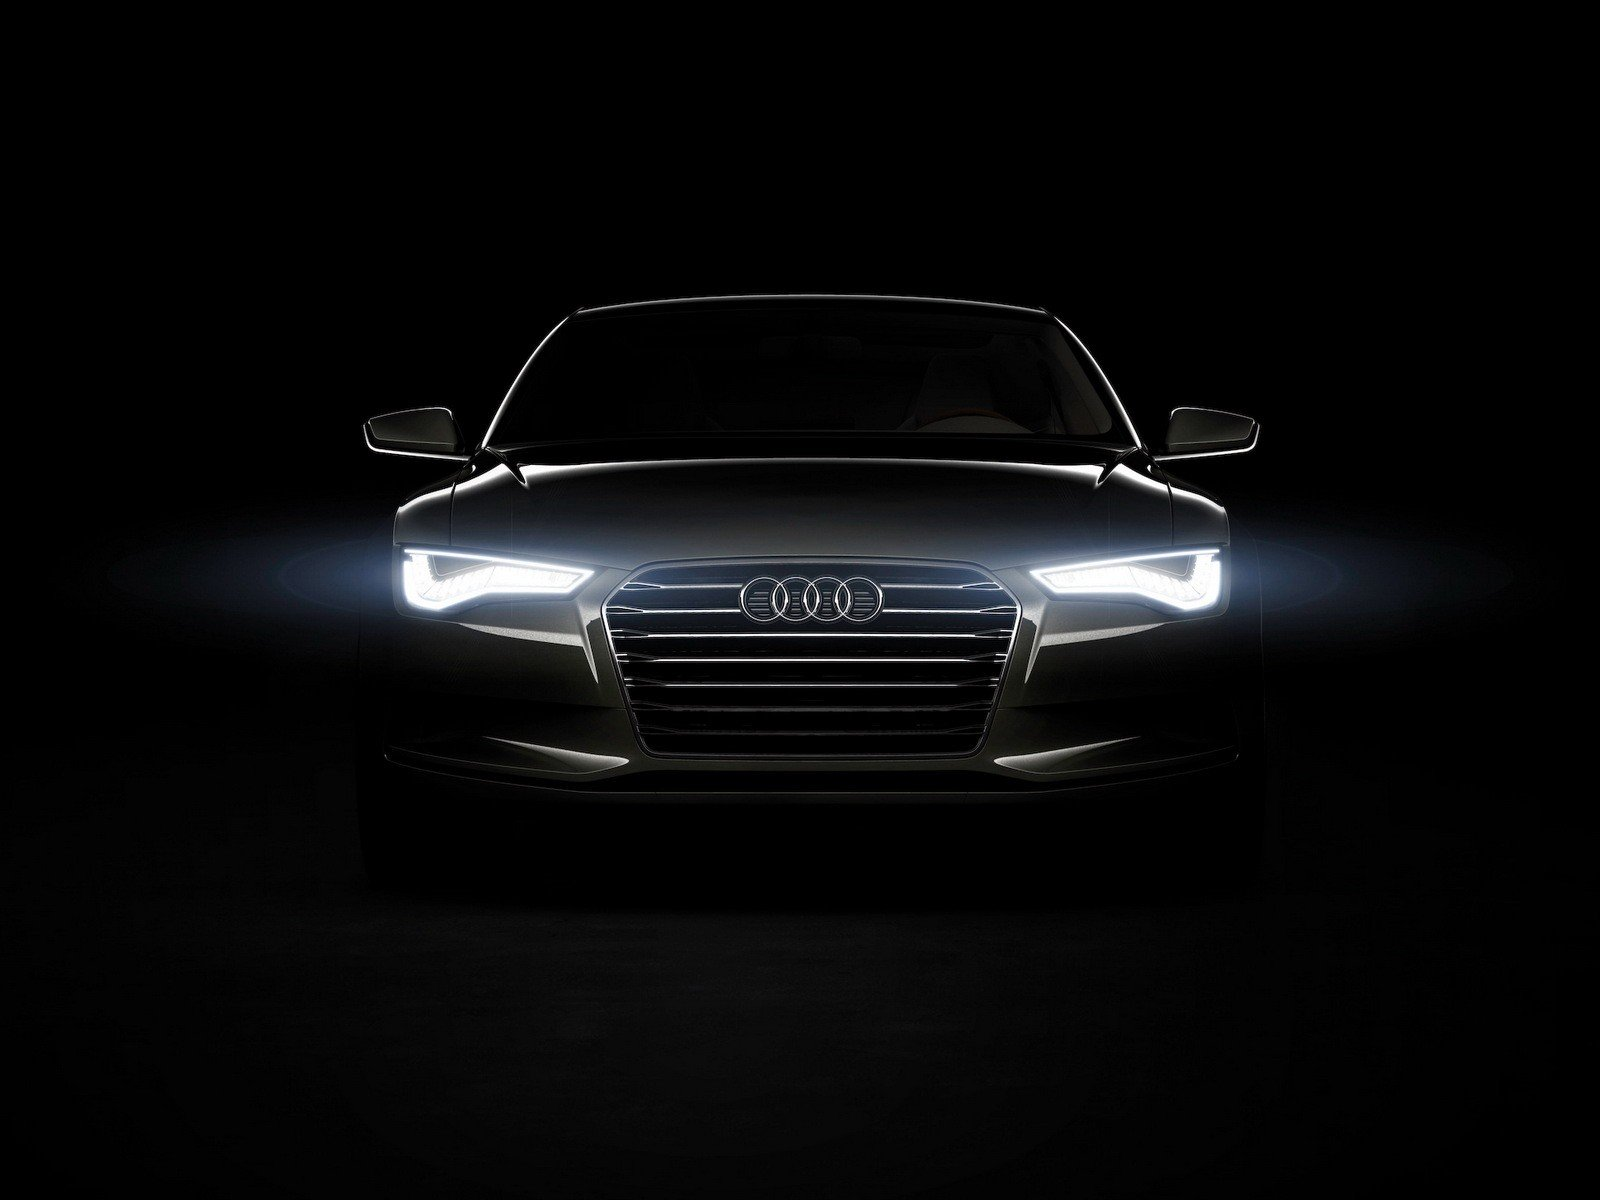 39+ Best Audi Wallpaper Hd PNG